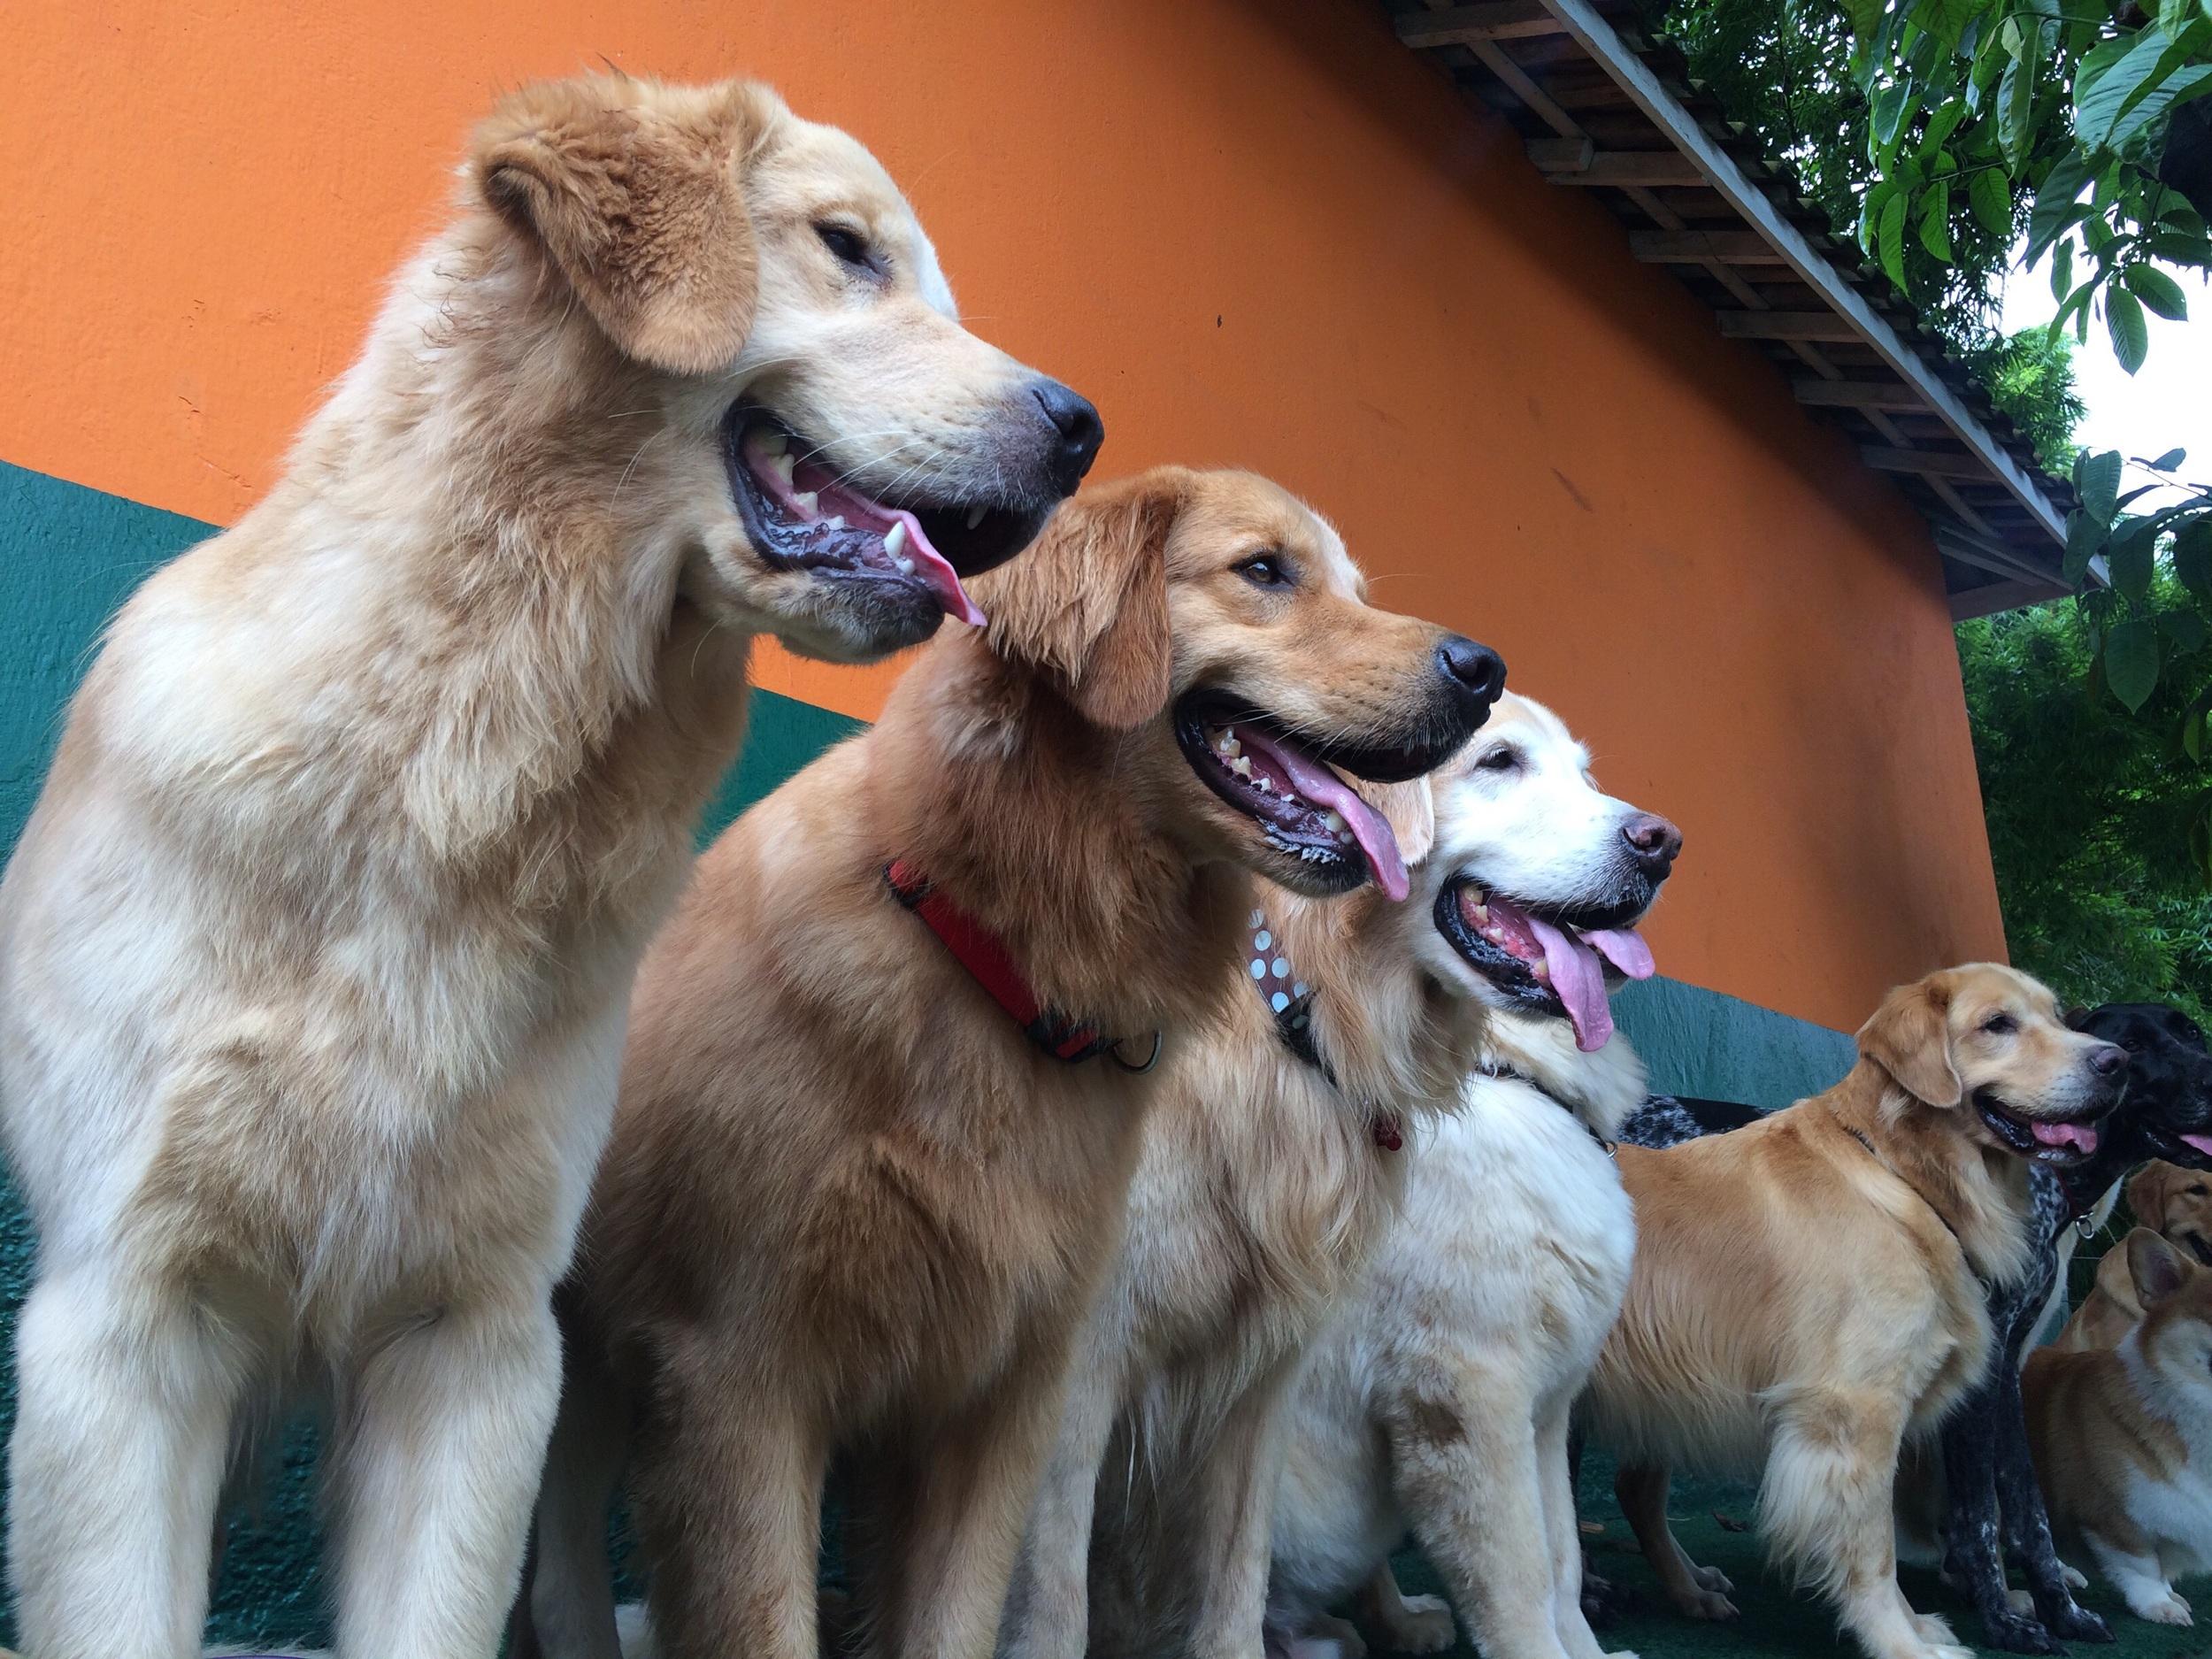 Siga a DogCamp no Instagram : @dogcampday